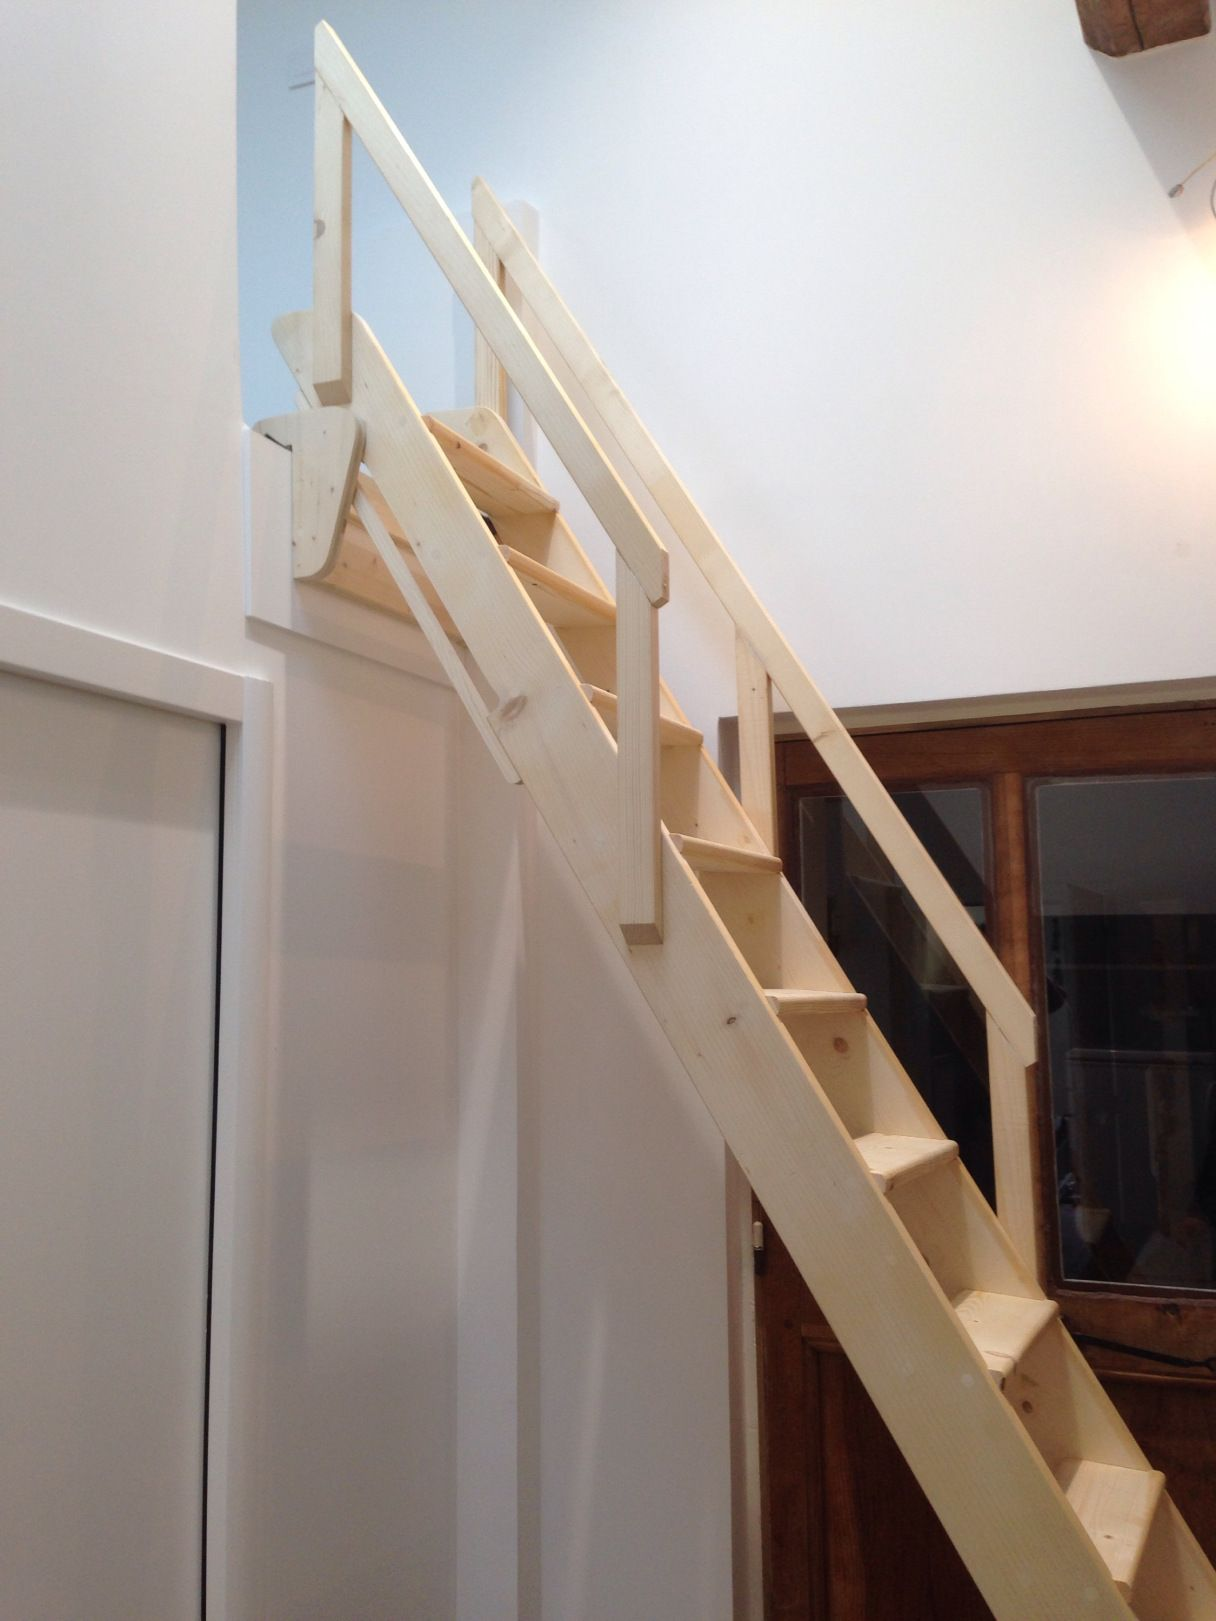 echenne meunière escamotable  echelle meunier escalier